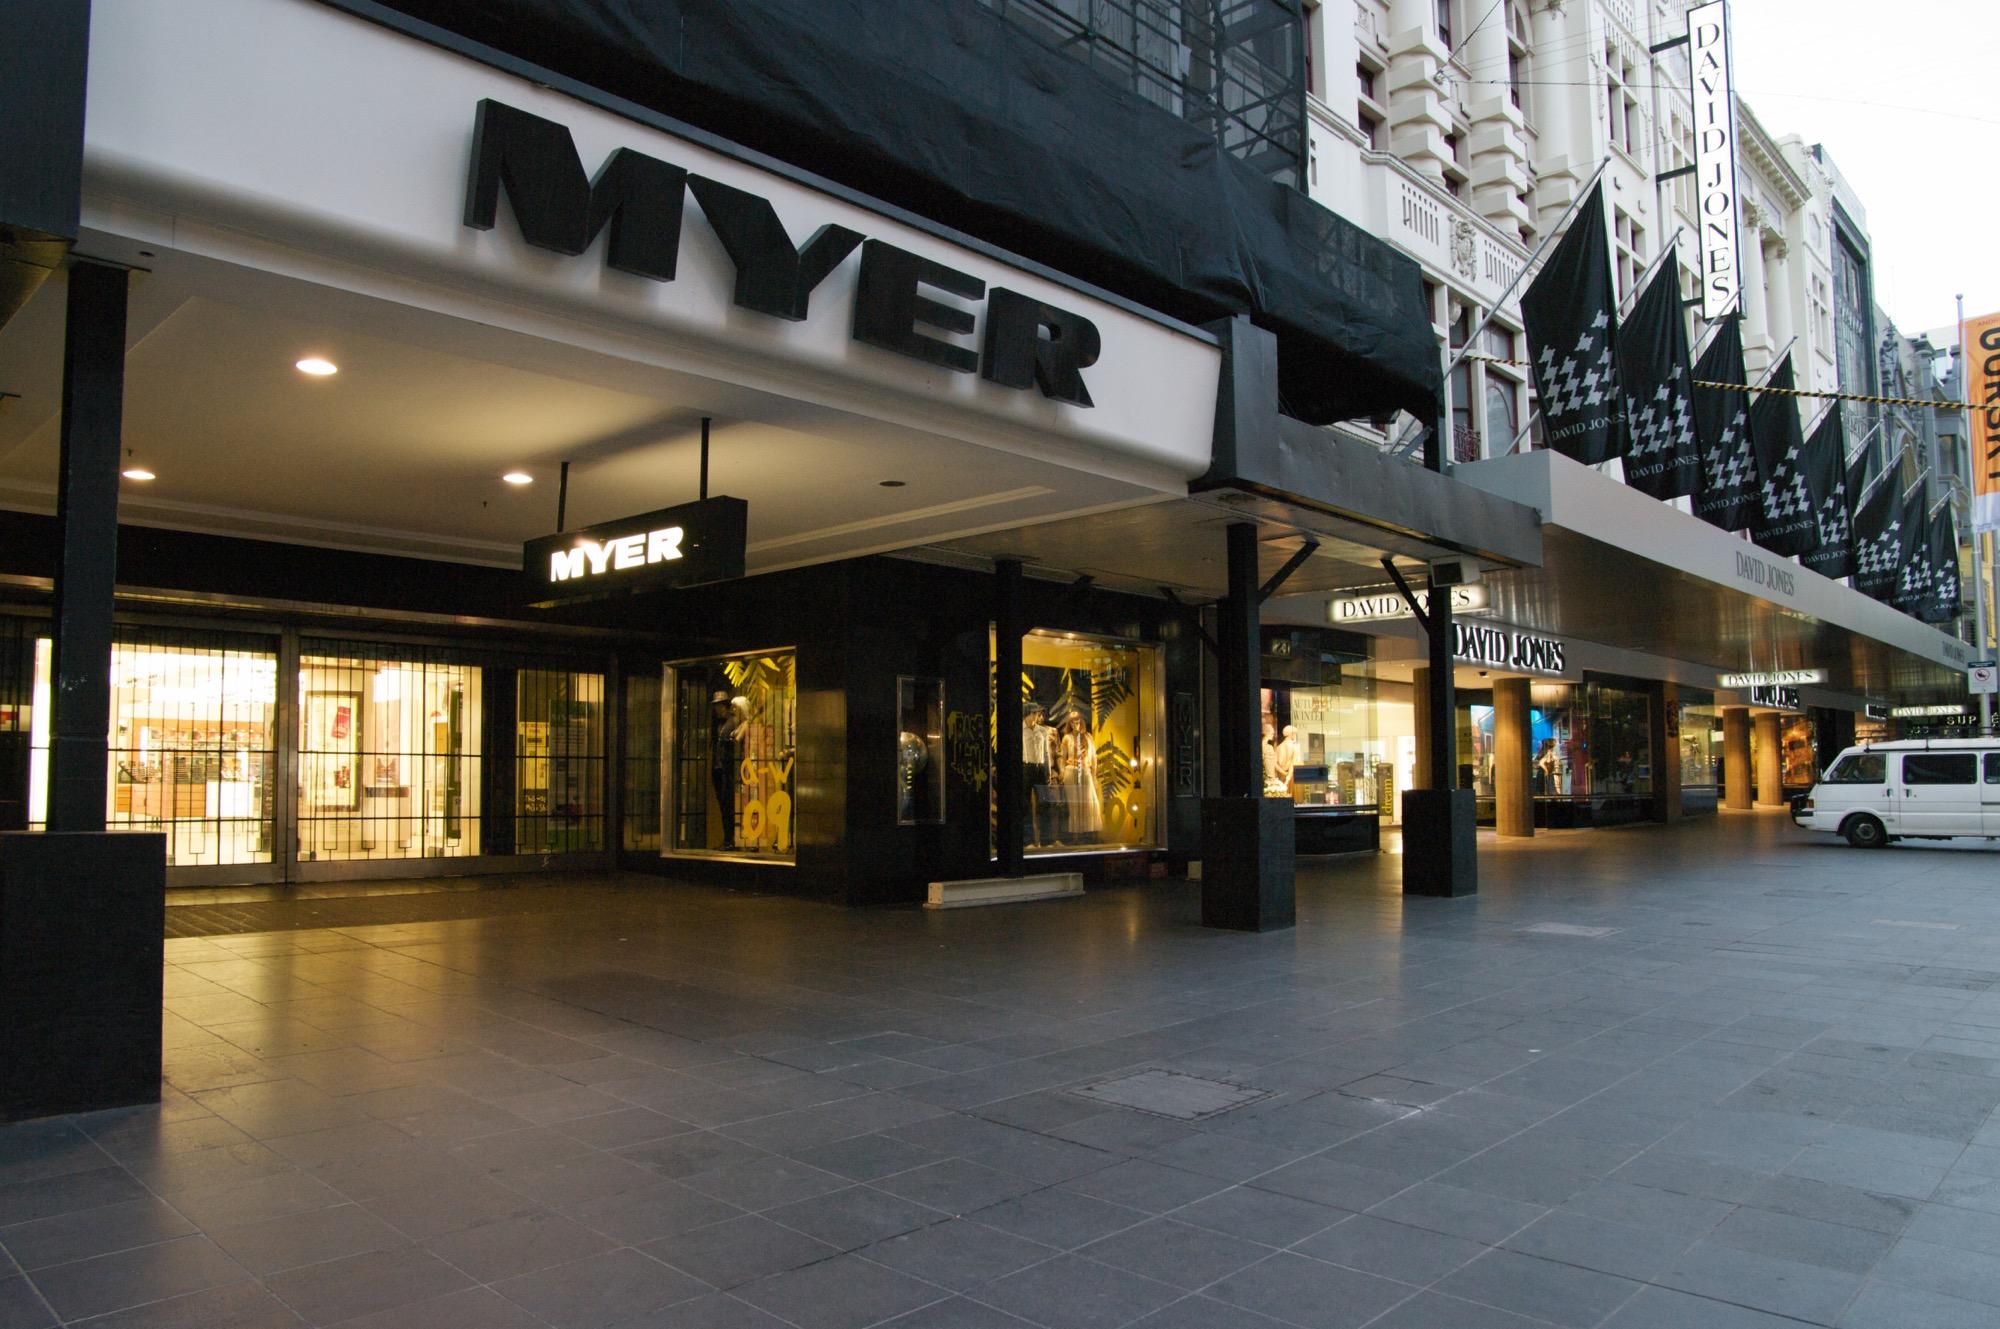 Melbourne stuff - 1 of 223 (193).jpg